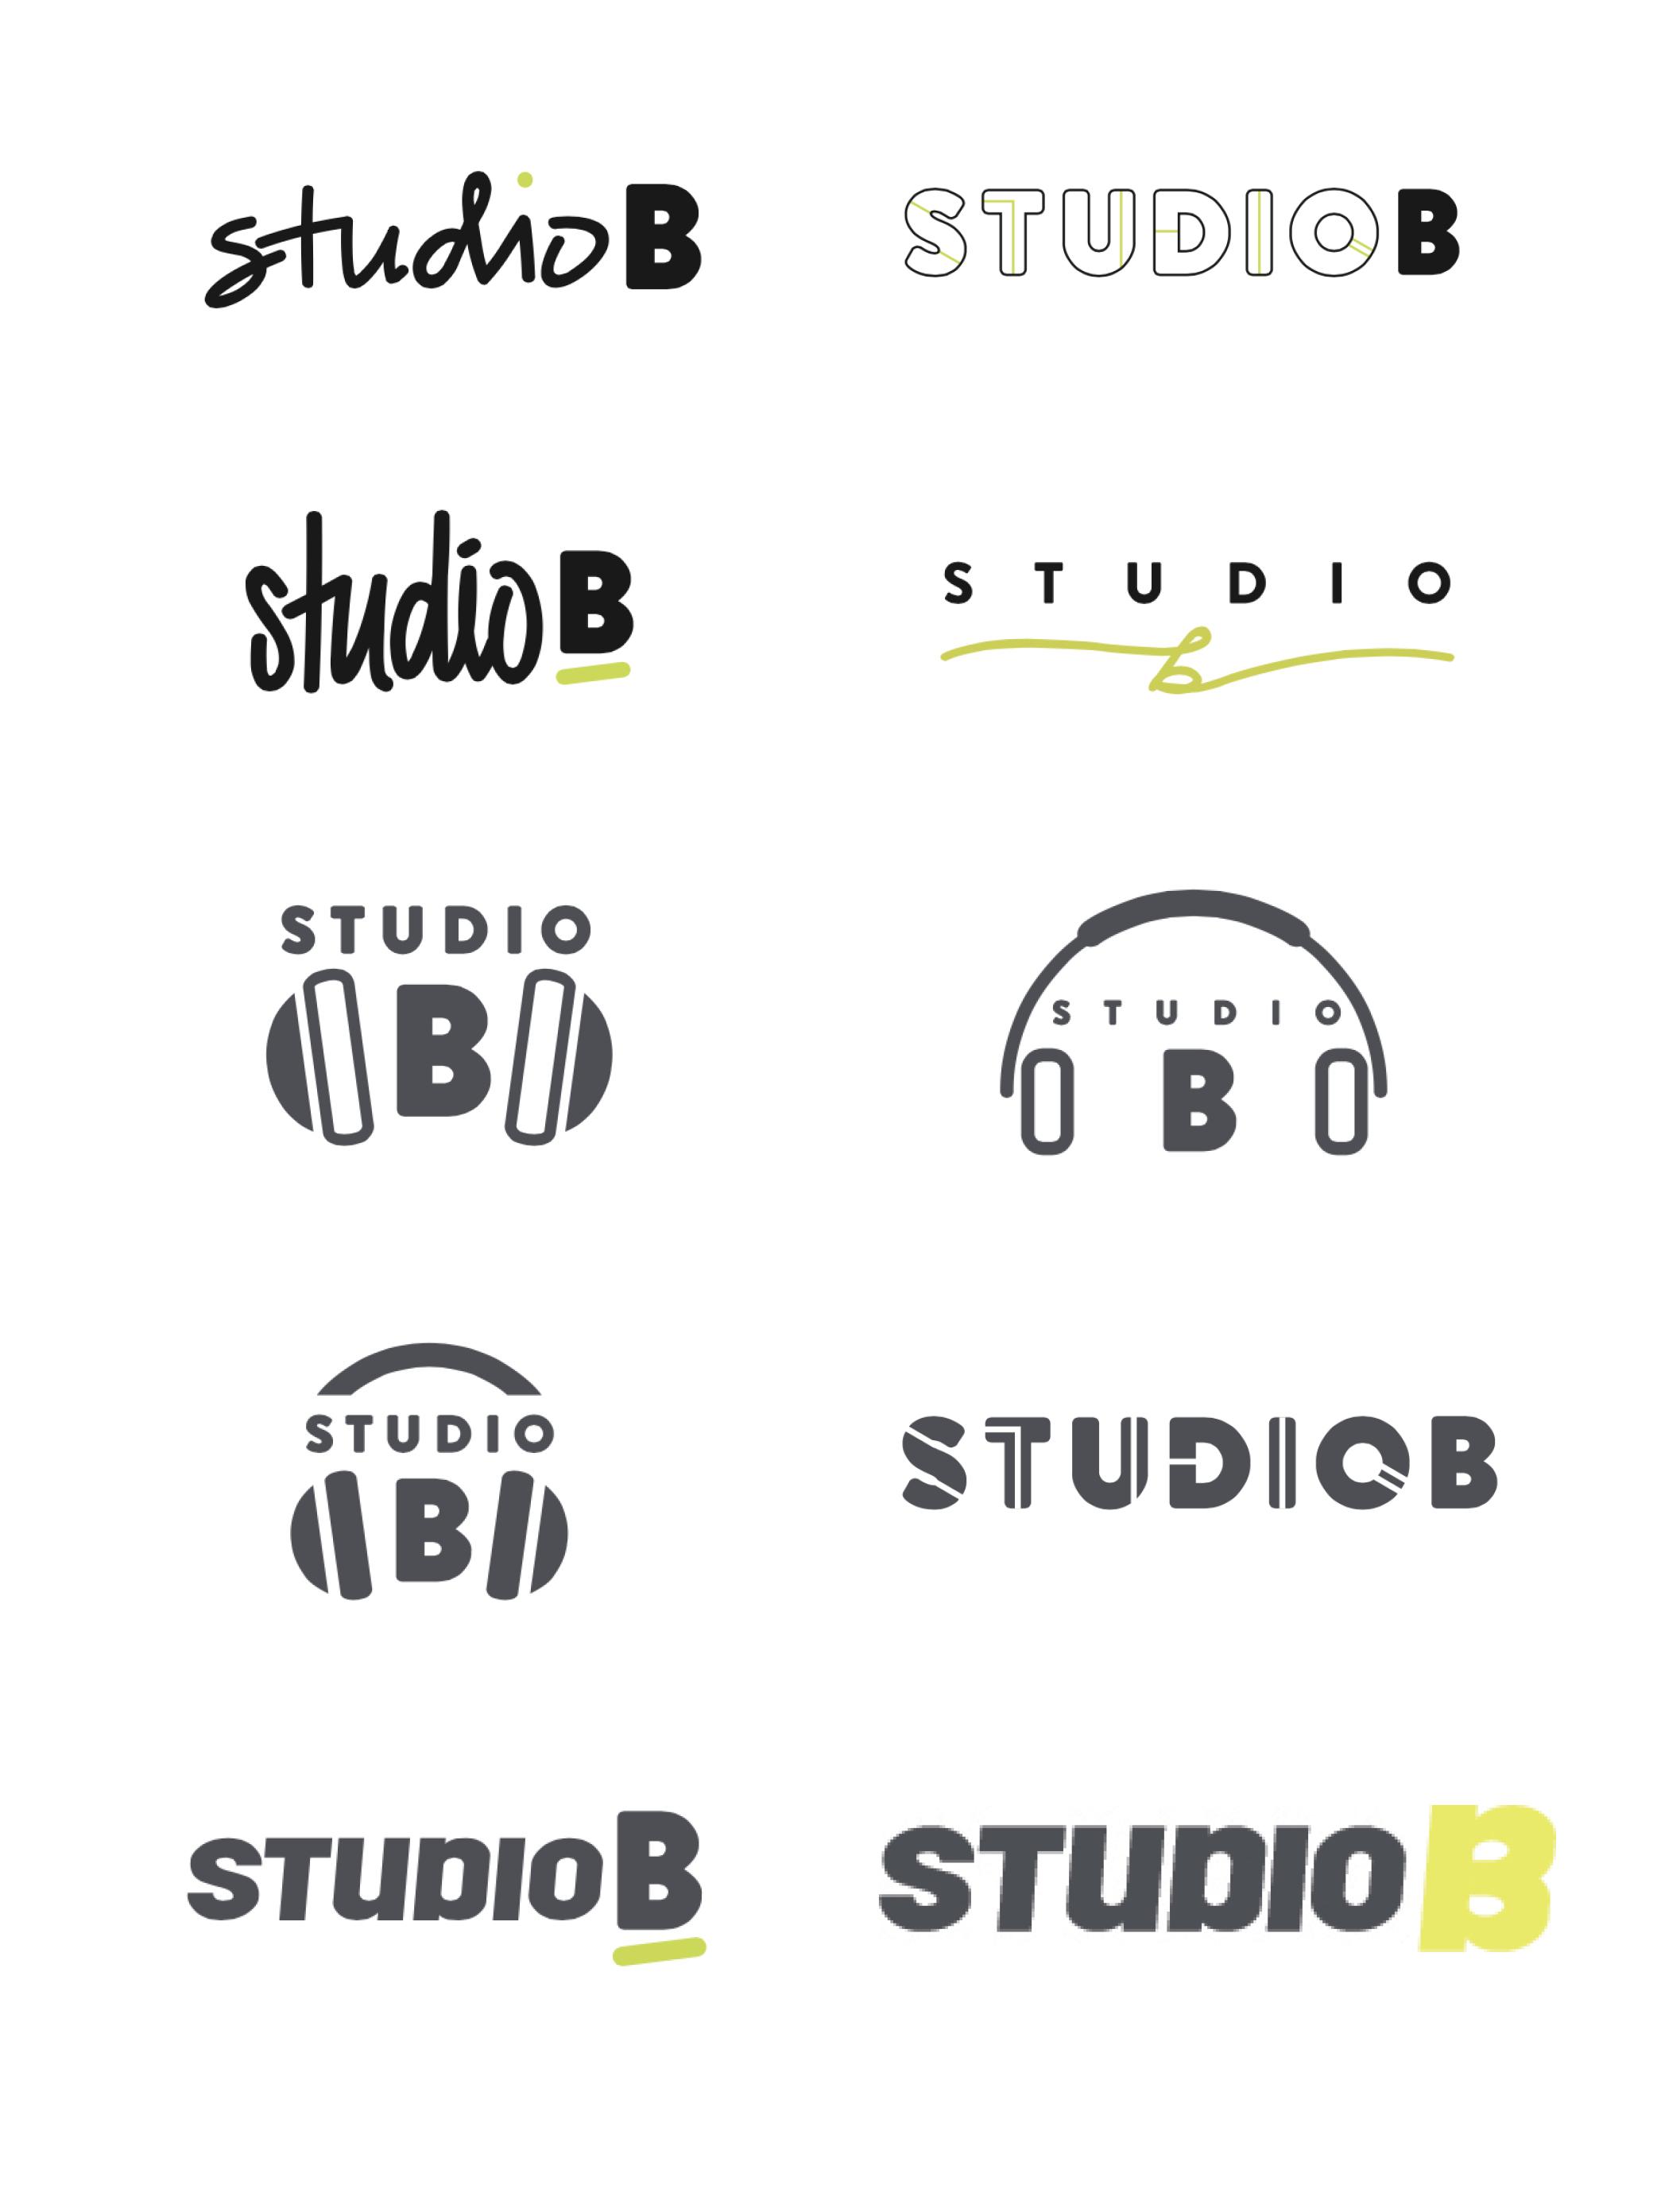 Bandier Studio B slideshow images6.jpg